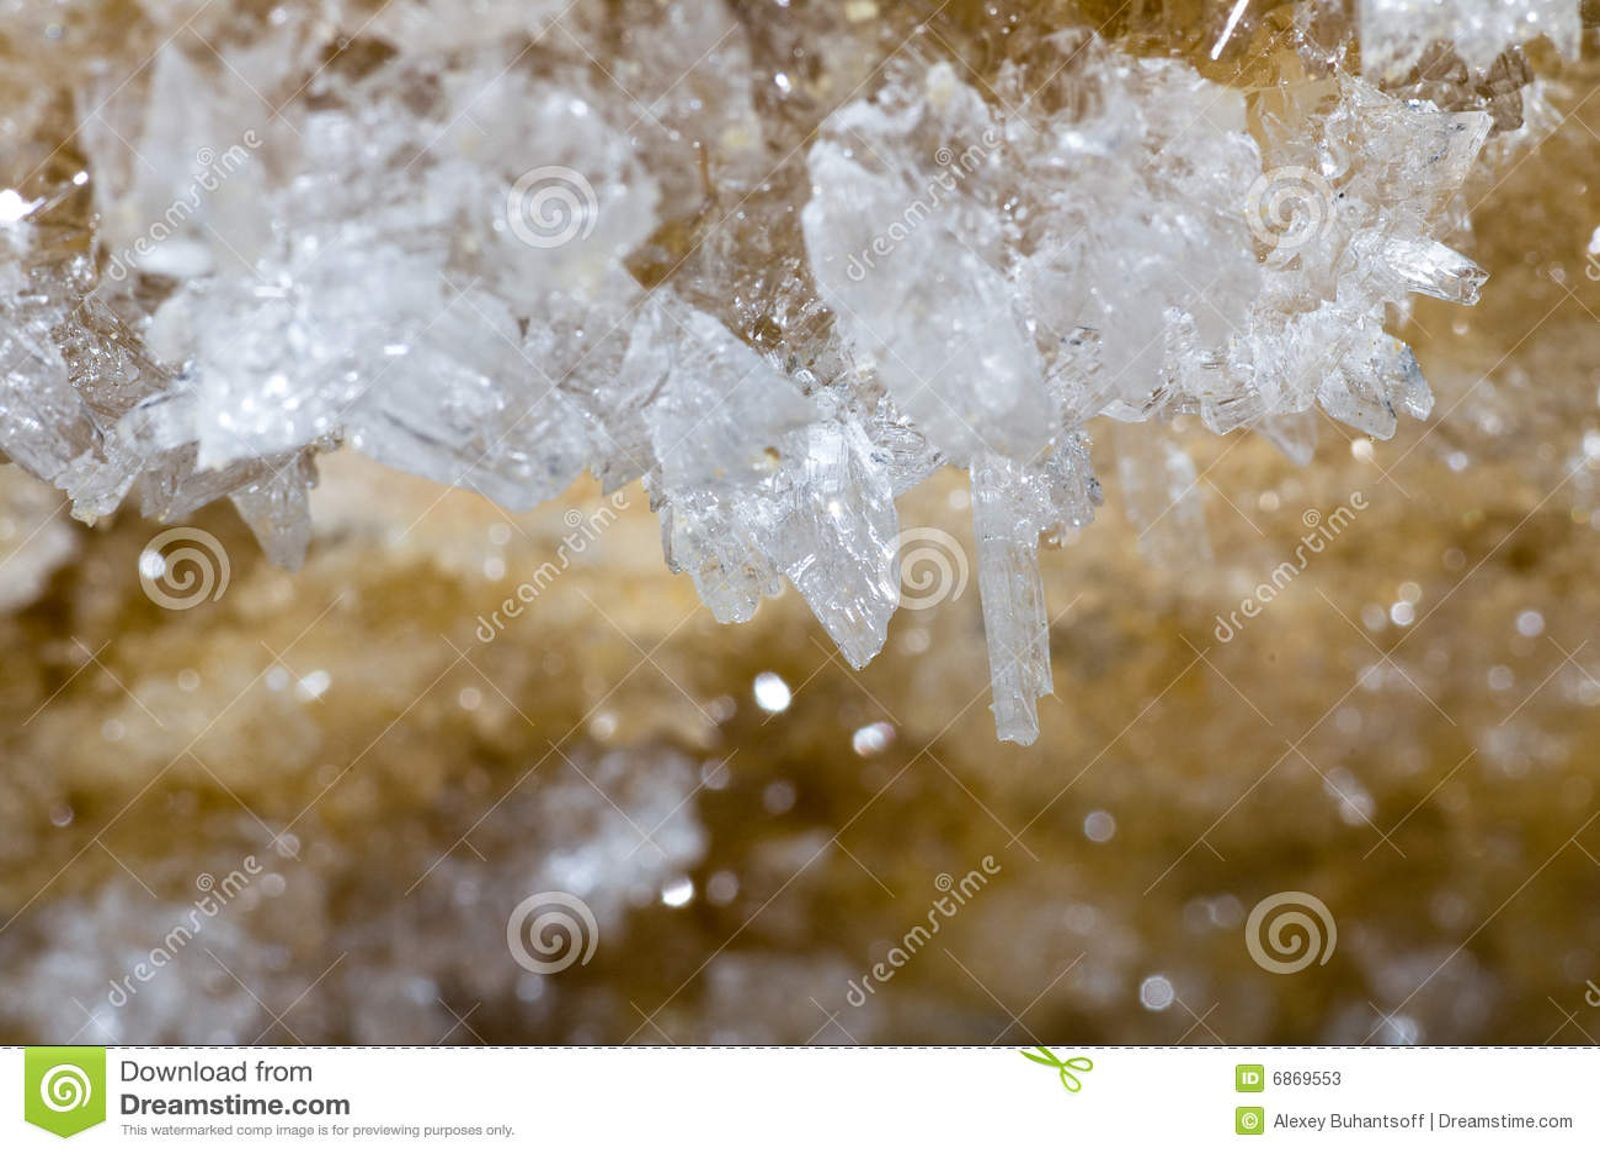 гипс кристаллов